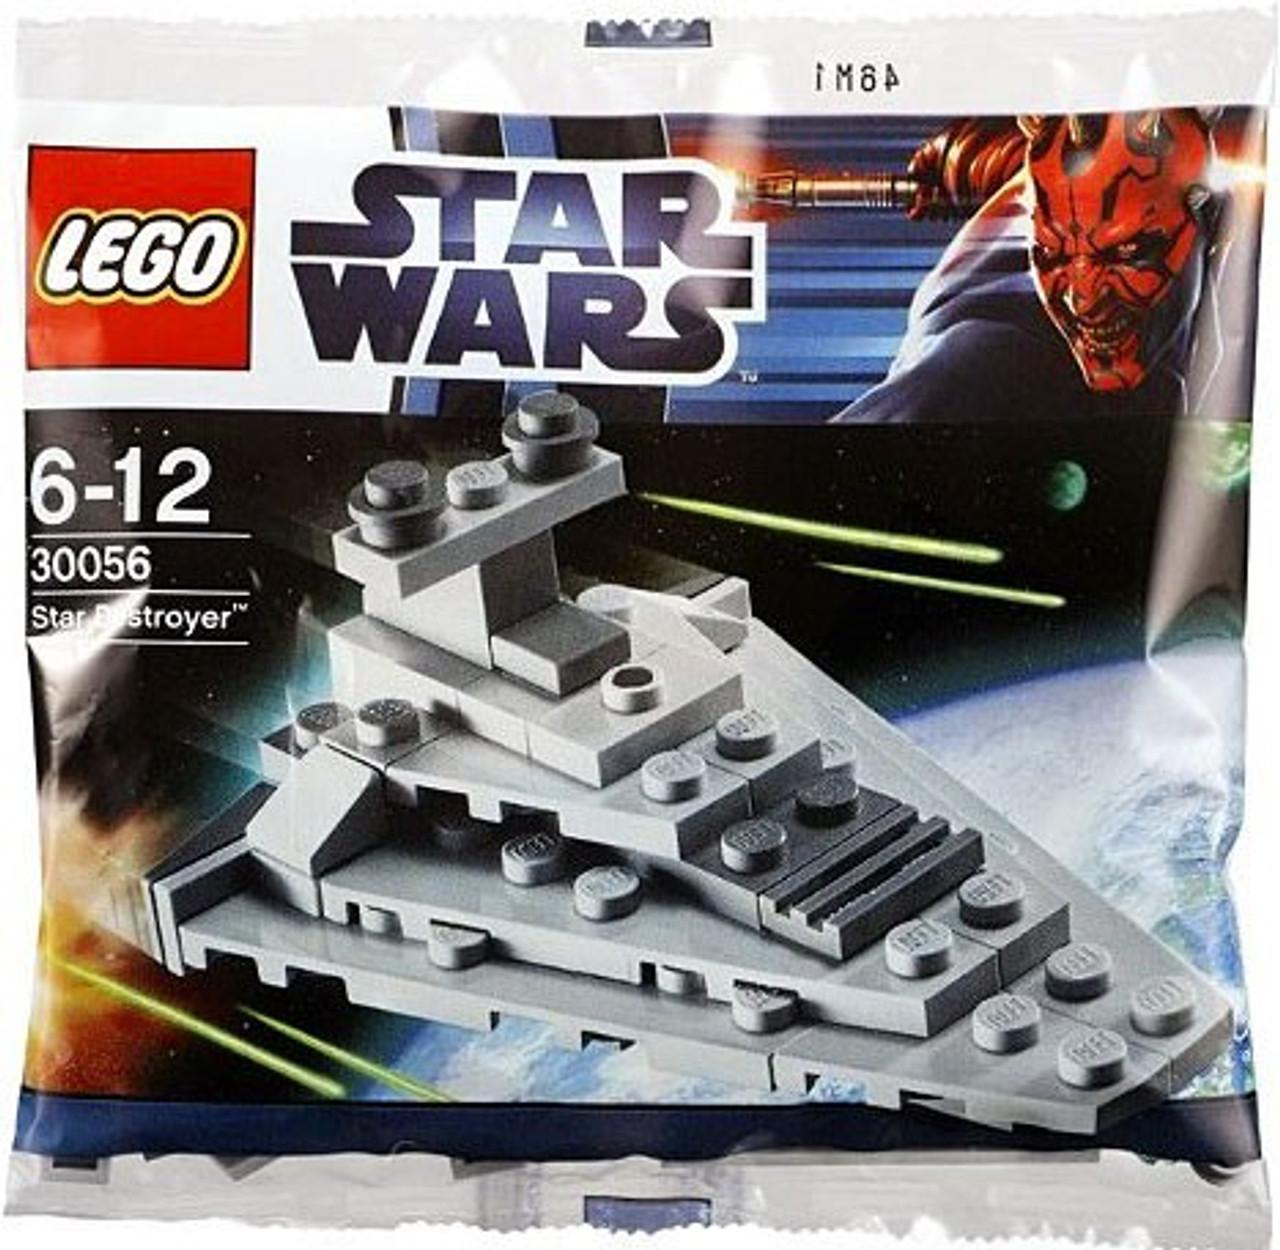 LEGO Star Wars A New Hope Star Destroyer Mini Set #30056 [Bagged]